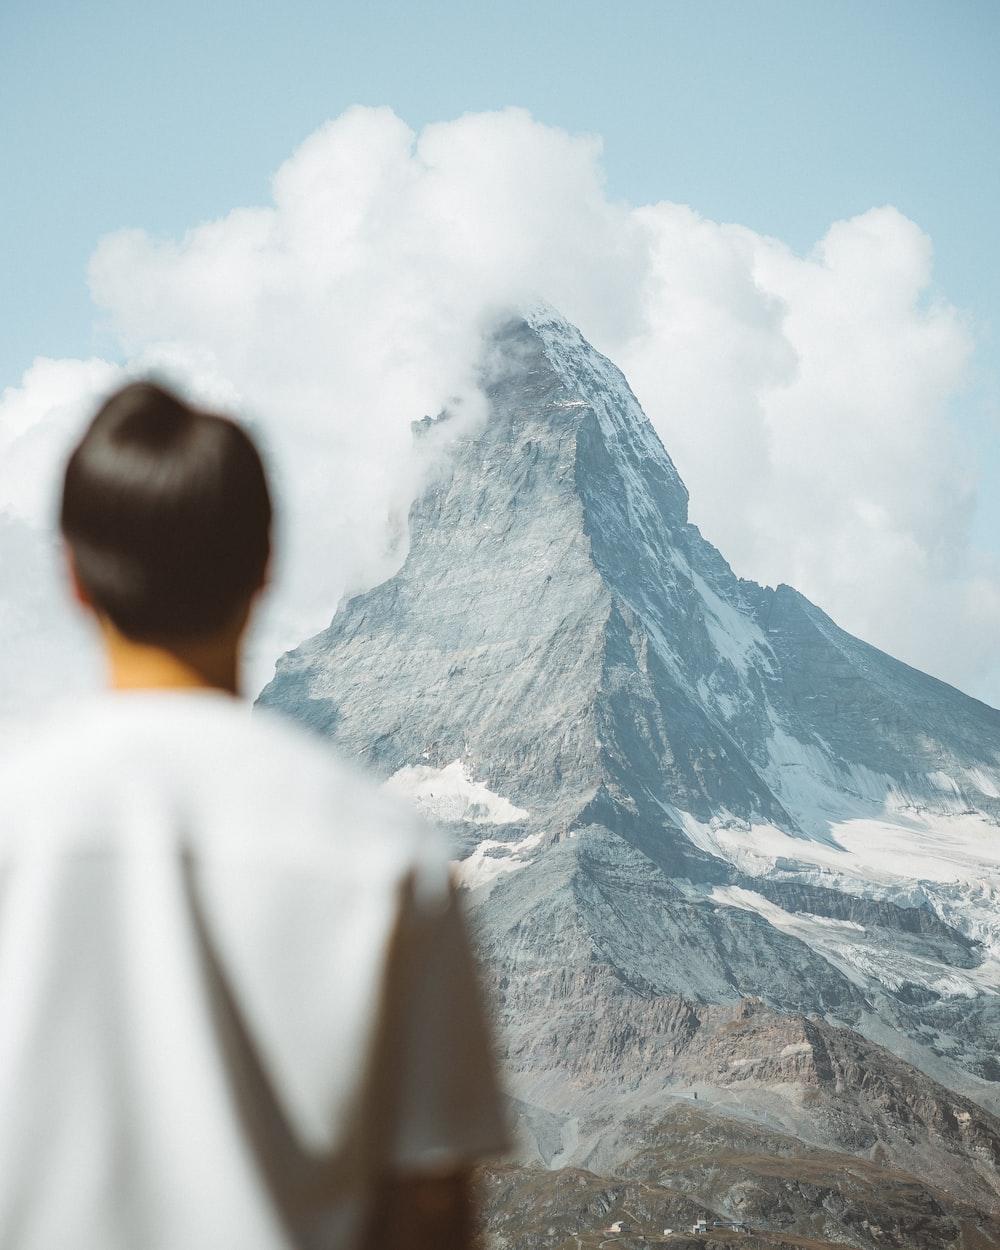 man in white shirt looking at mountain